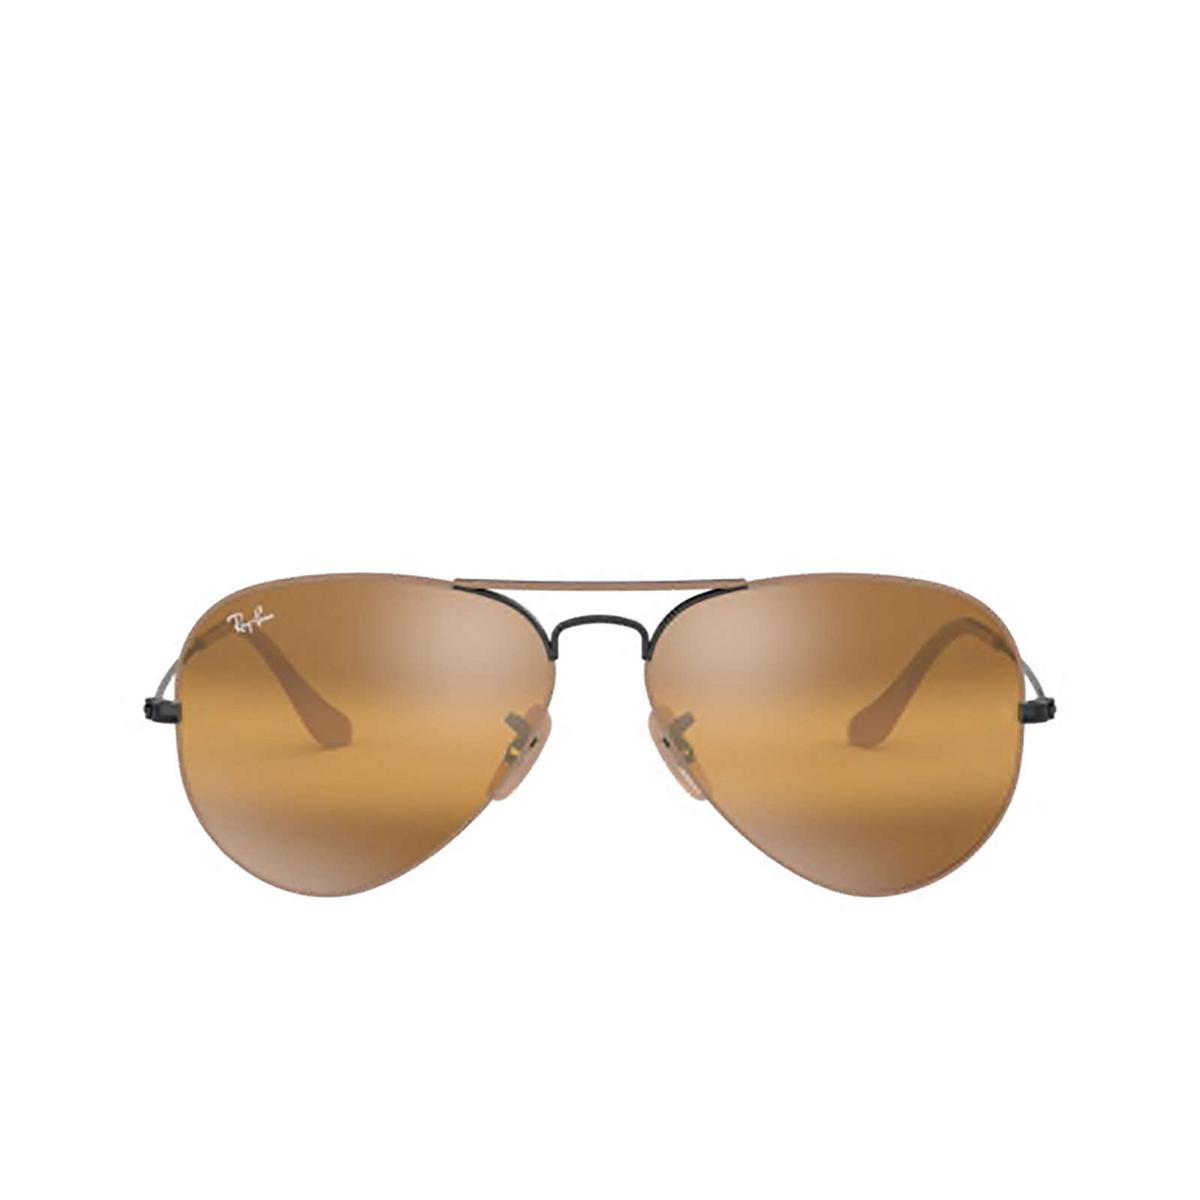 Ray-Ban® Aviator Sunglasses: Aviator Large Metal RB3025 color Matte Beige On Black 9153AG.